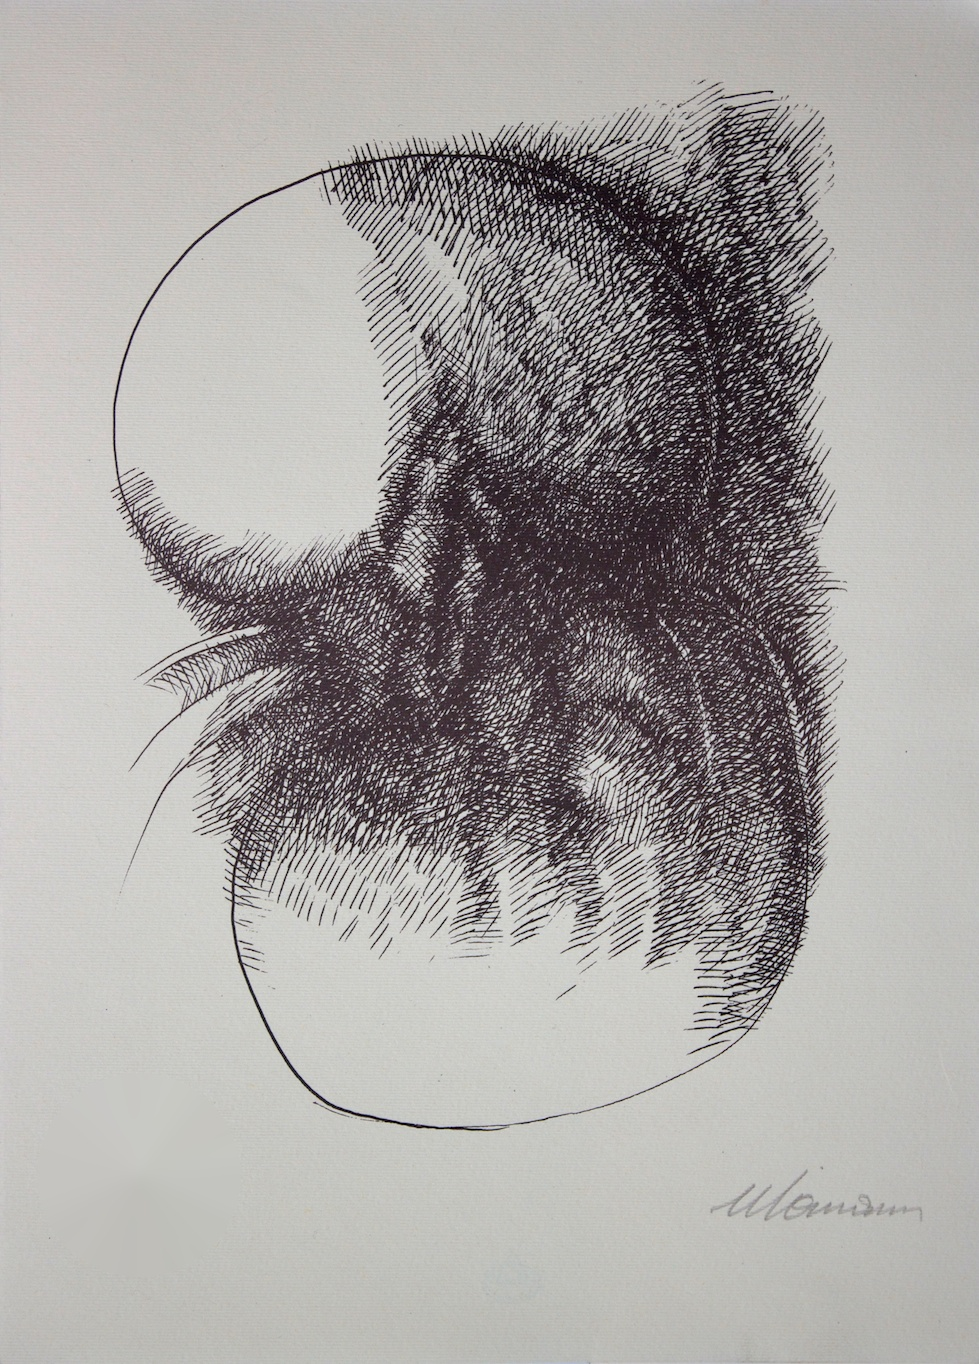 Cellule - Cells / incisione su carta - engraving on paper. 1971